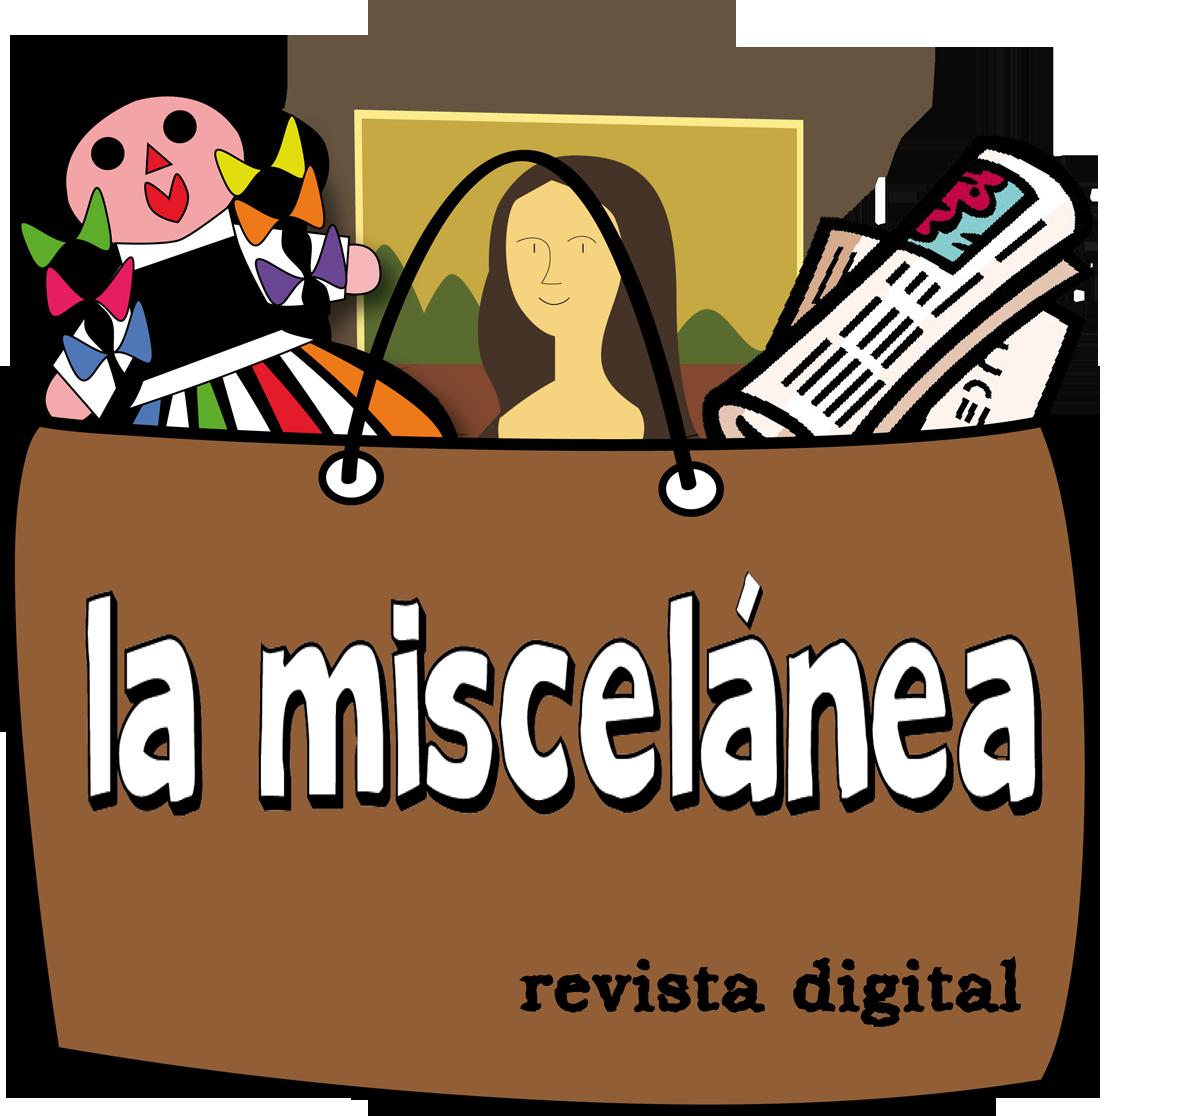 la miscelanea logo pequeño